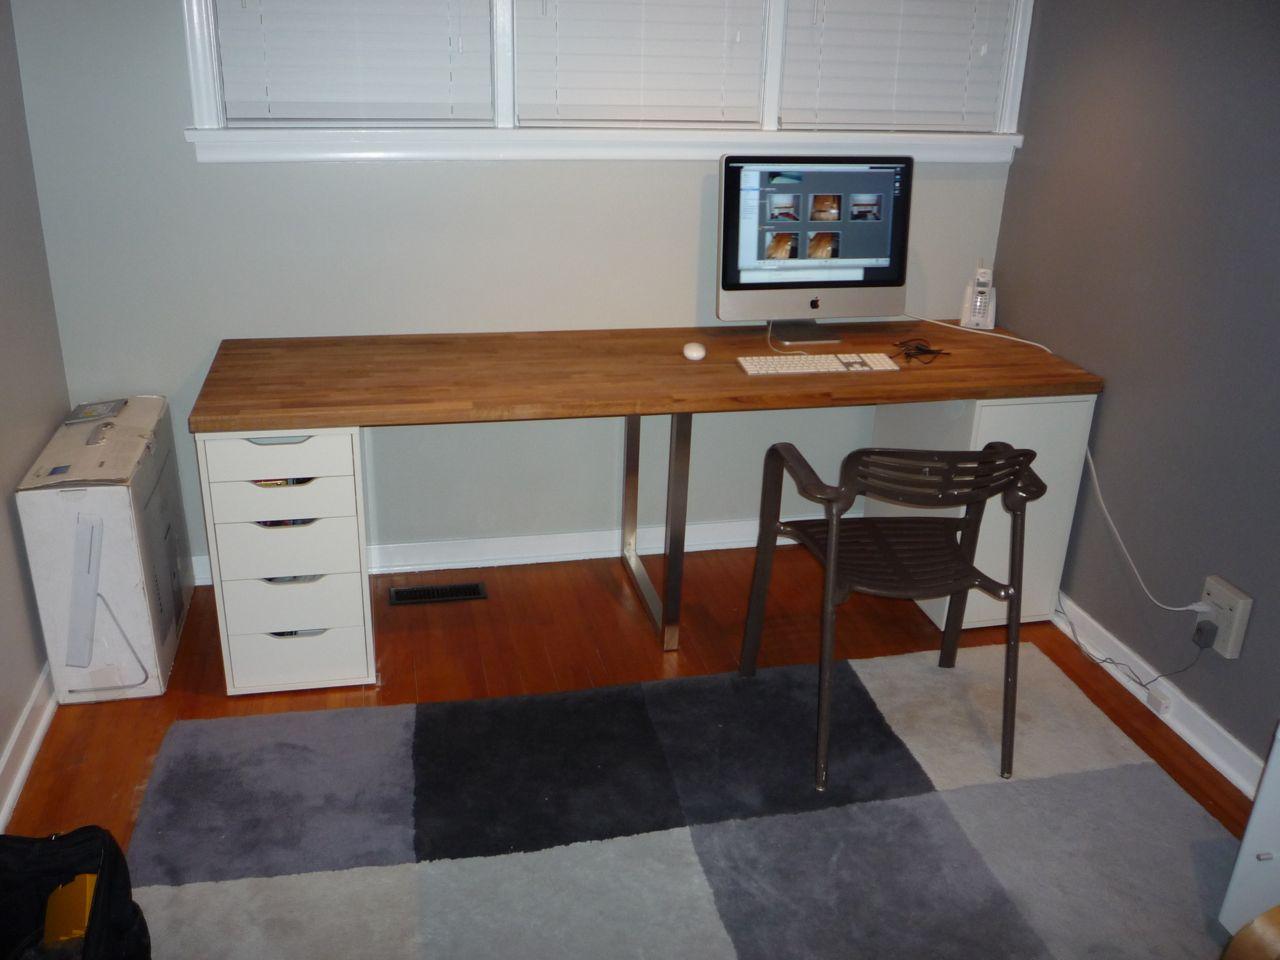 Giant Ikea Numerar Desk 6 Steps Instructables